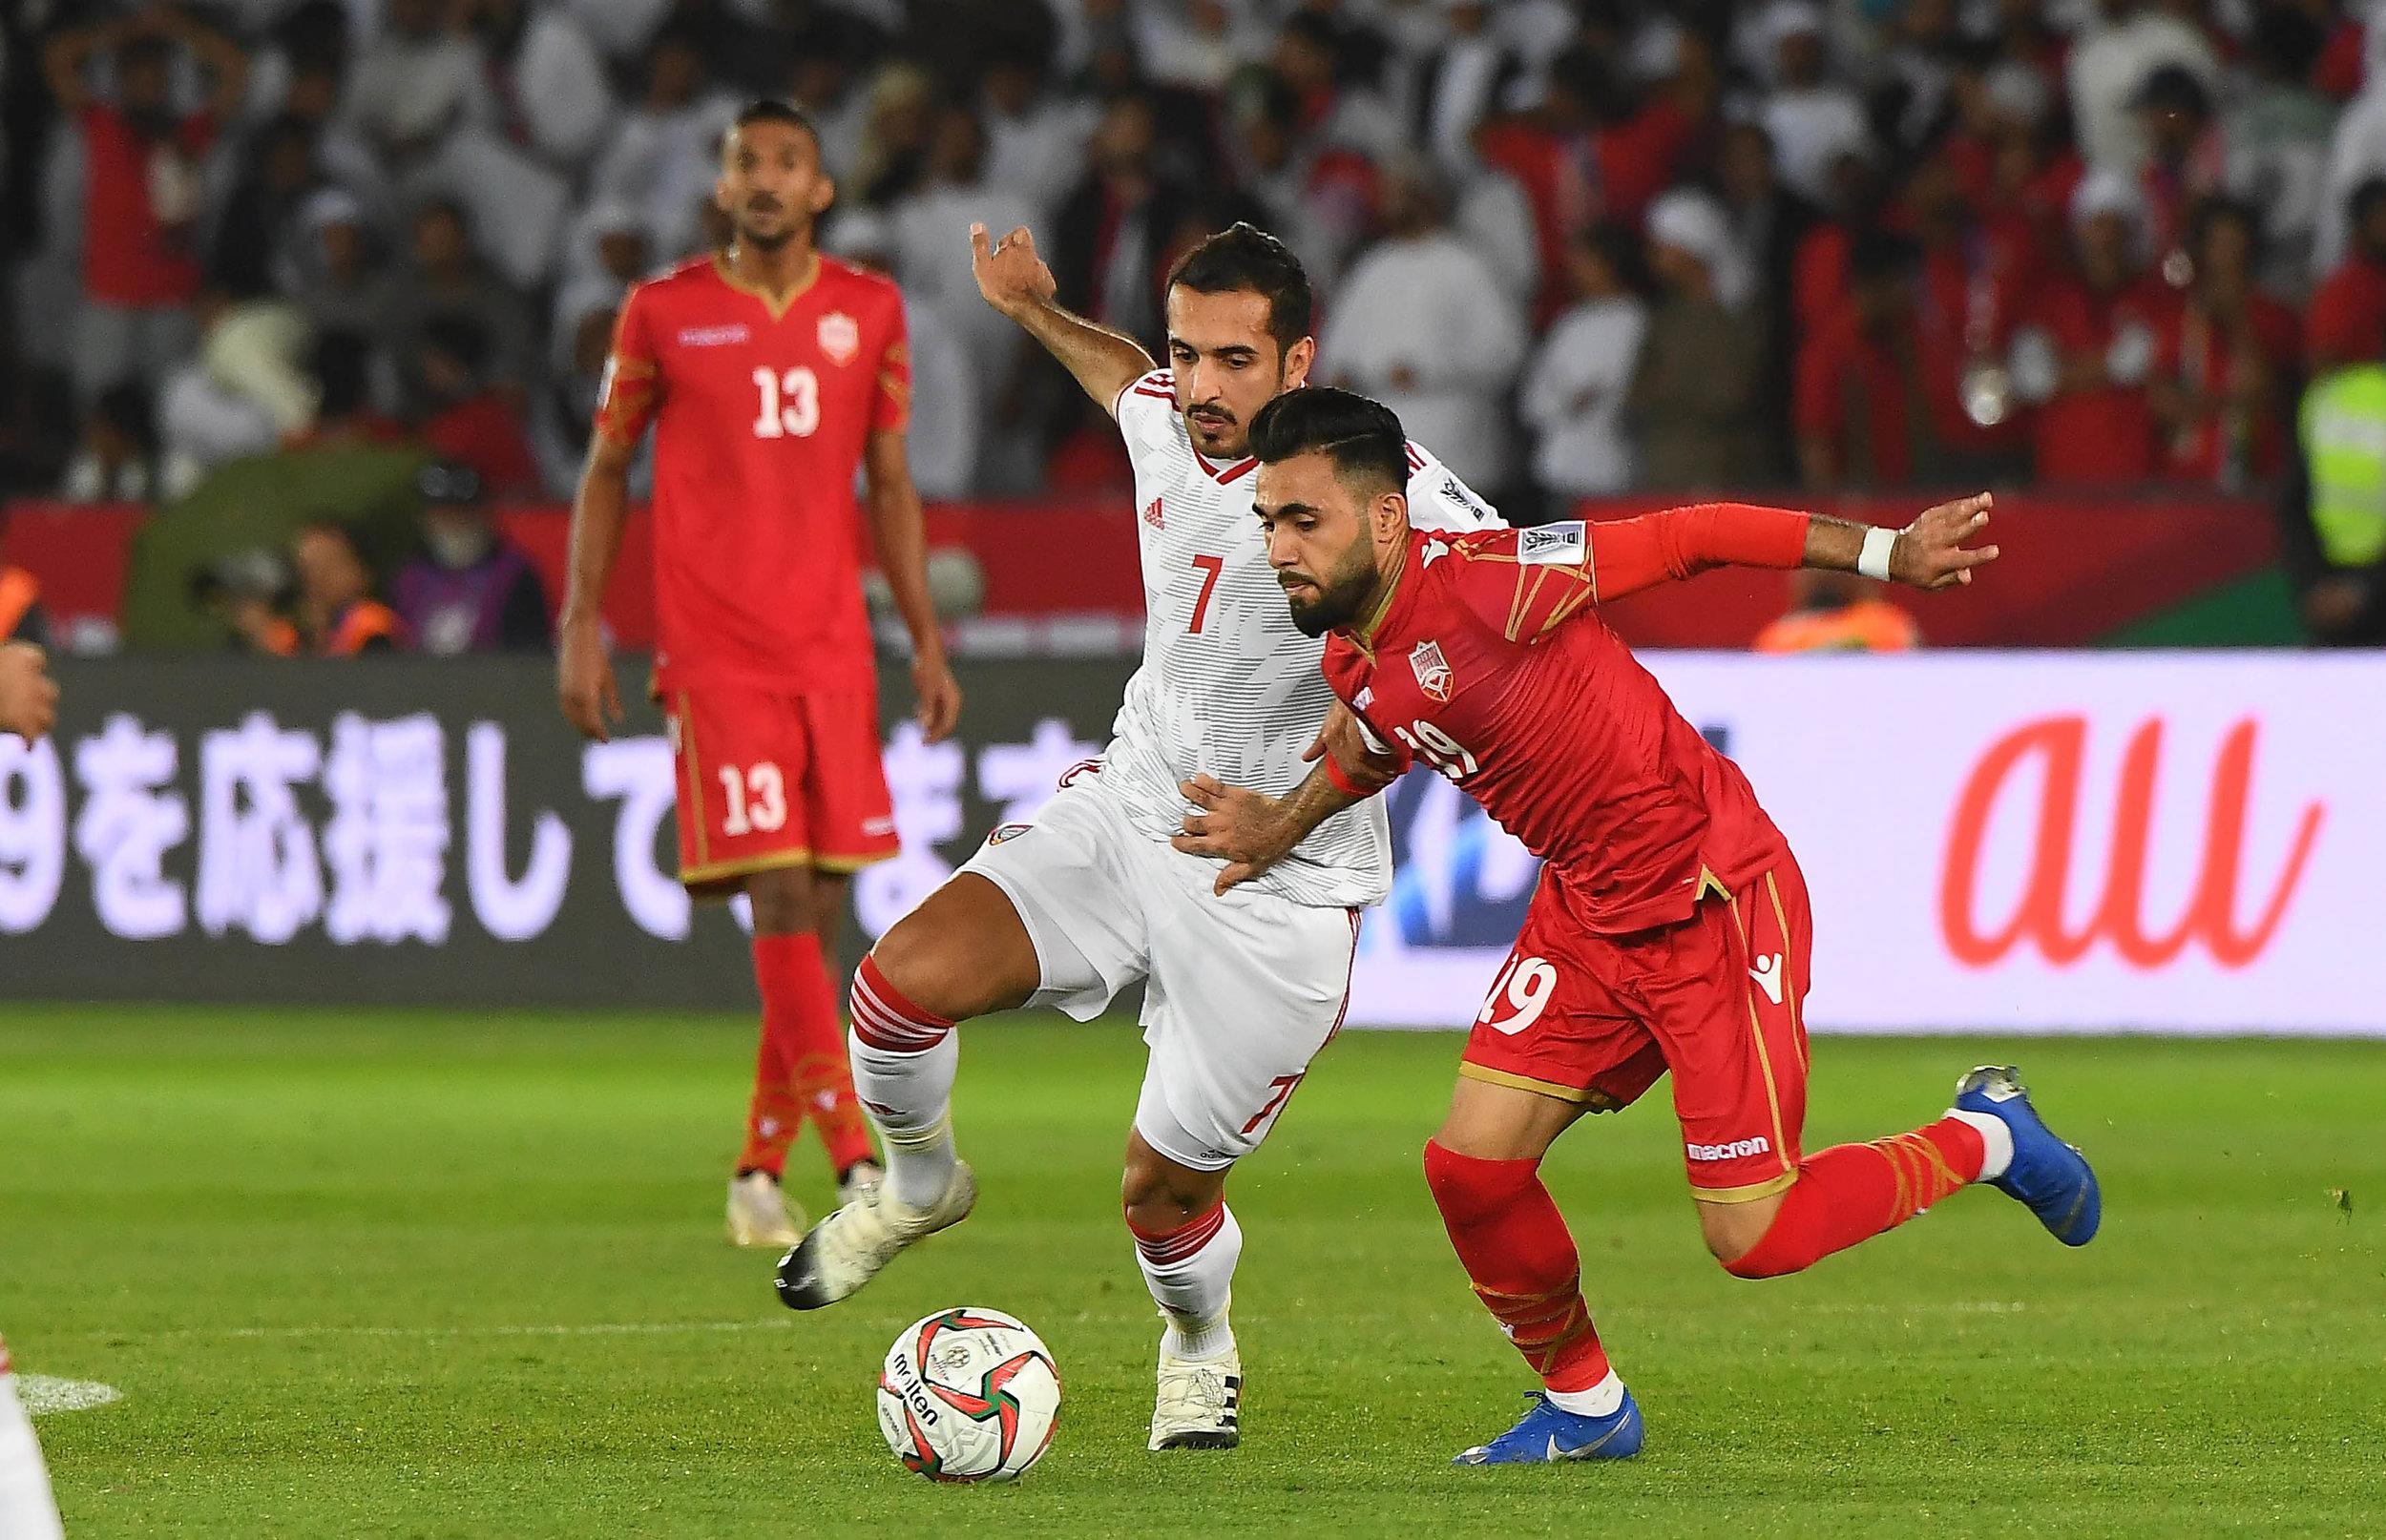 Ali Mabkhout, his team almot failed to handle Bahrain well (2019 Asian Football Confederation (AFC))